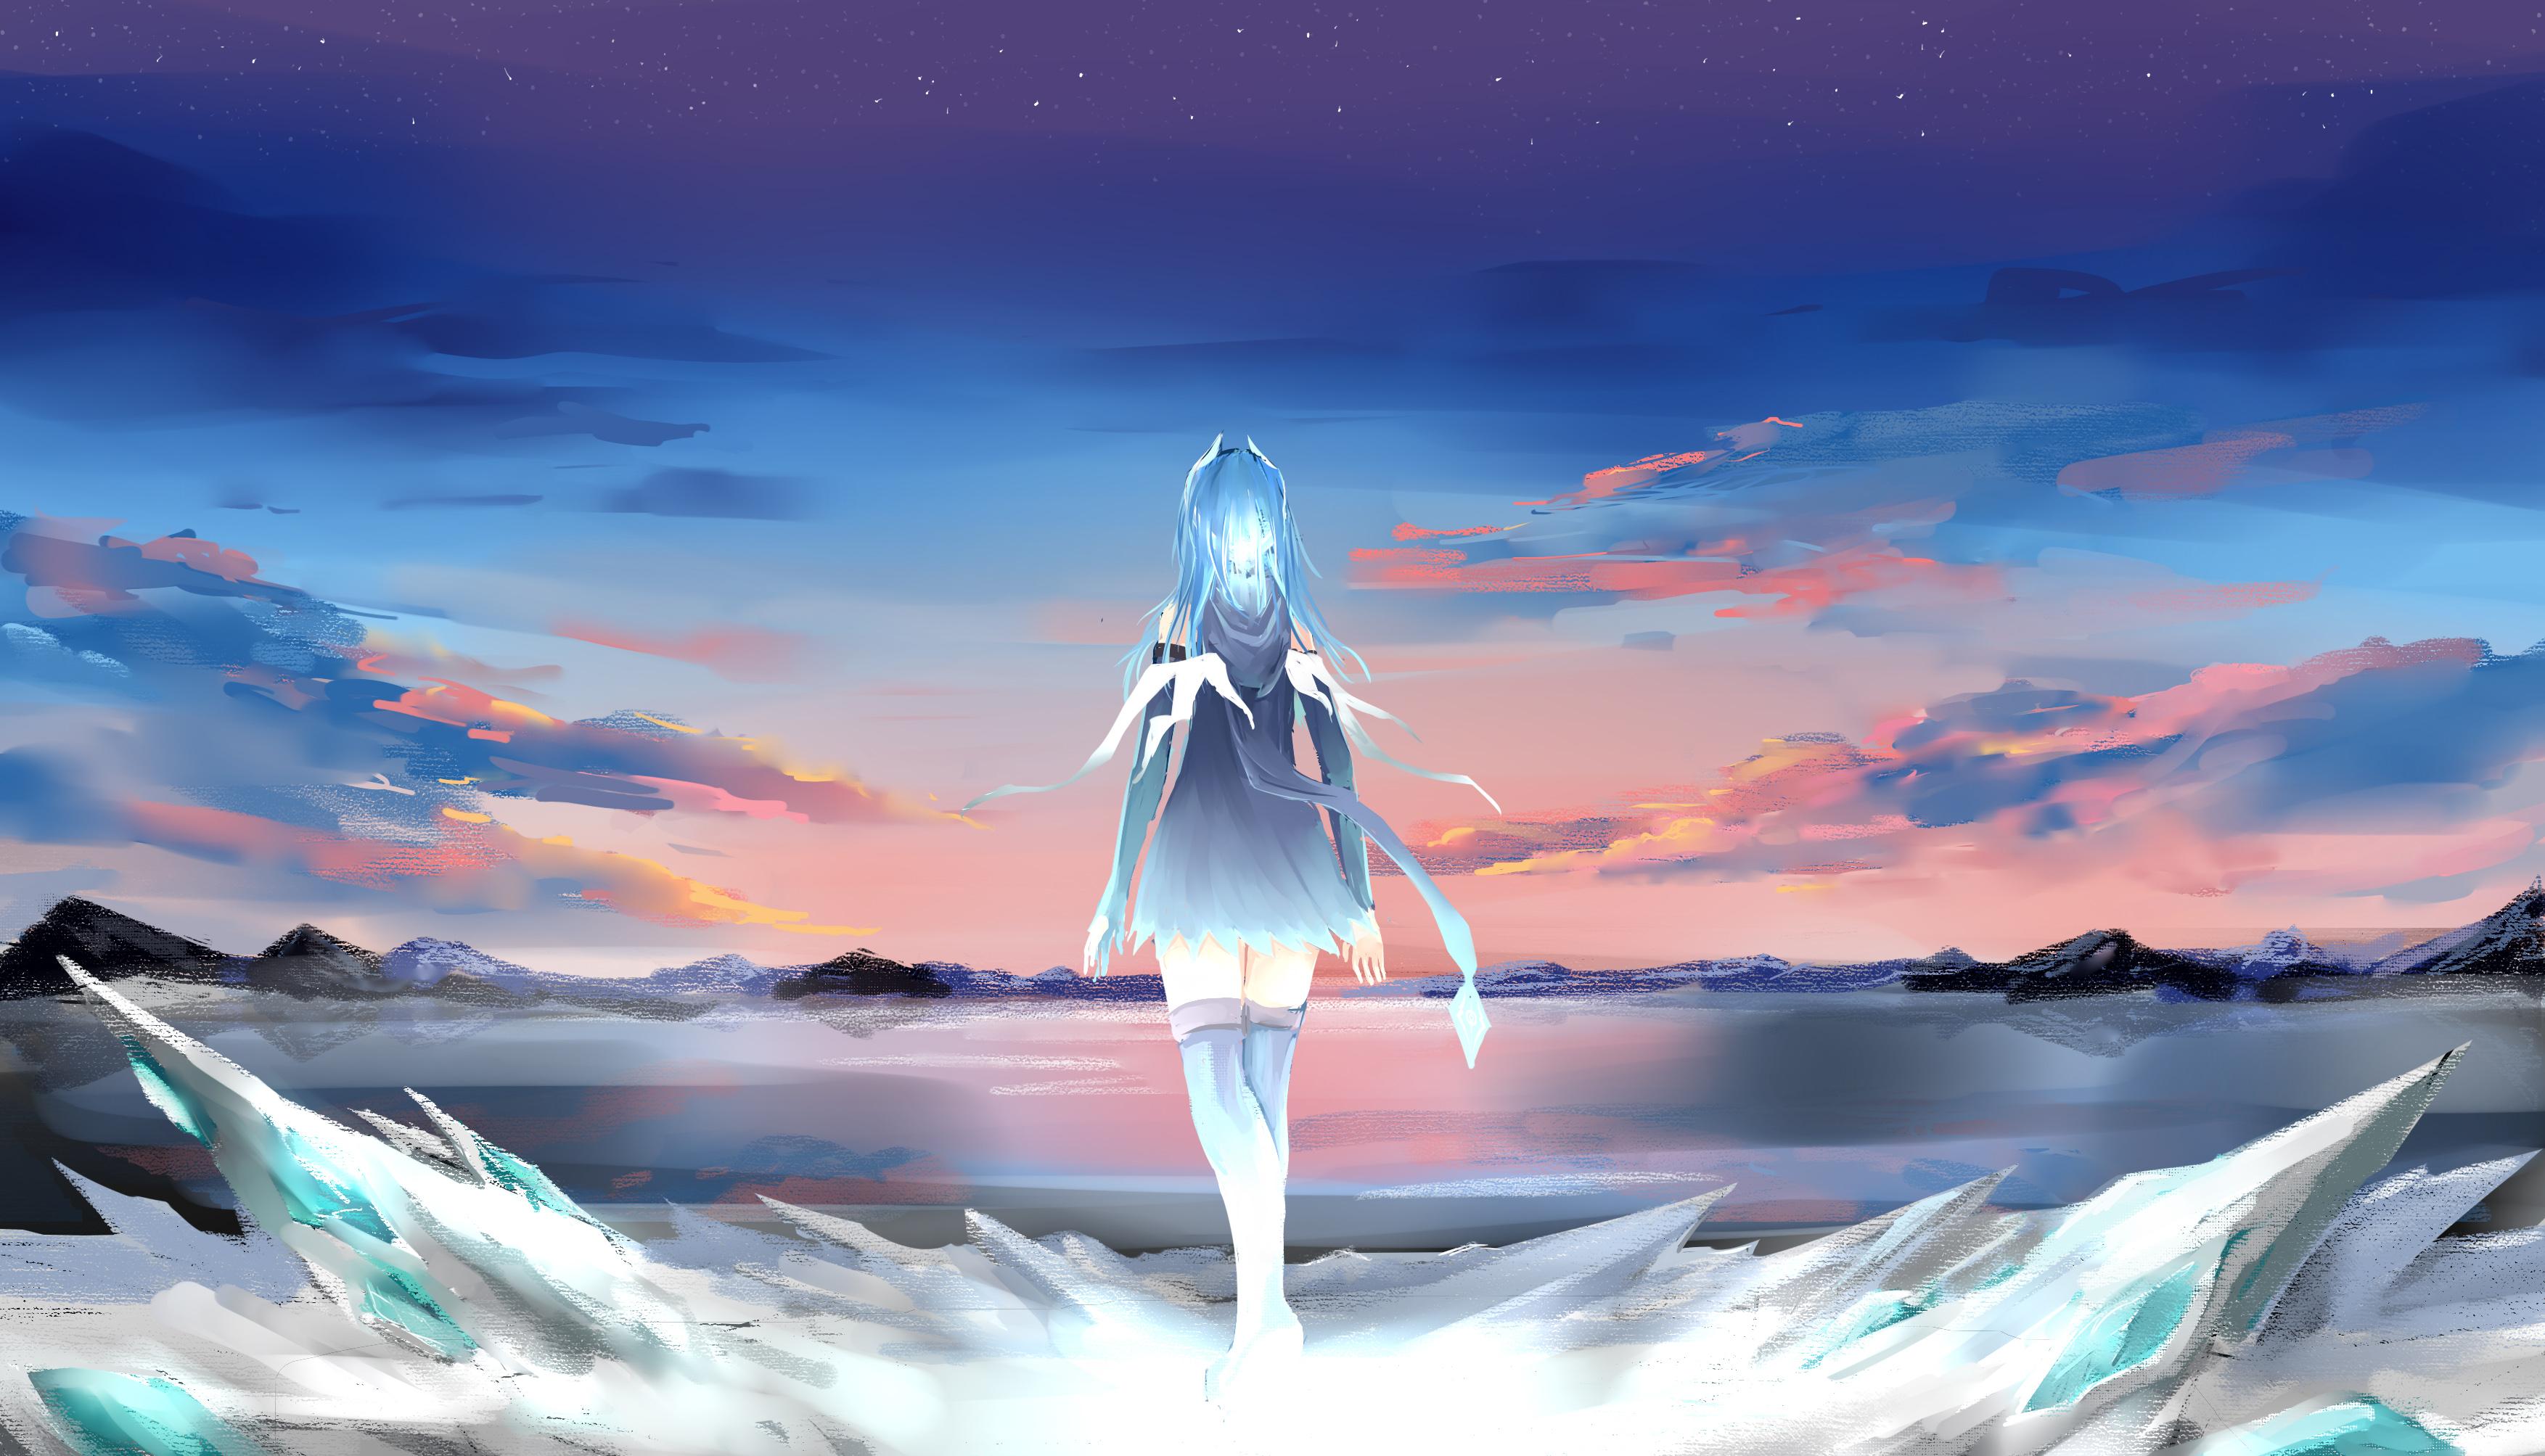 Anime 3507x2007 anime anime girls Pixiv Fantasia clouds mountains blue hair long hair sunset sea stars ribbons walking ice